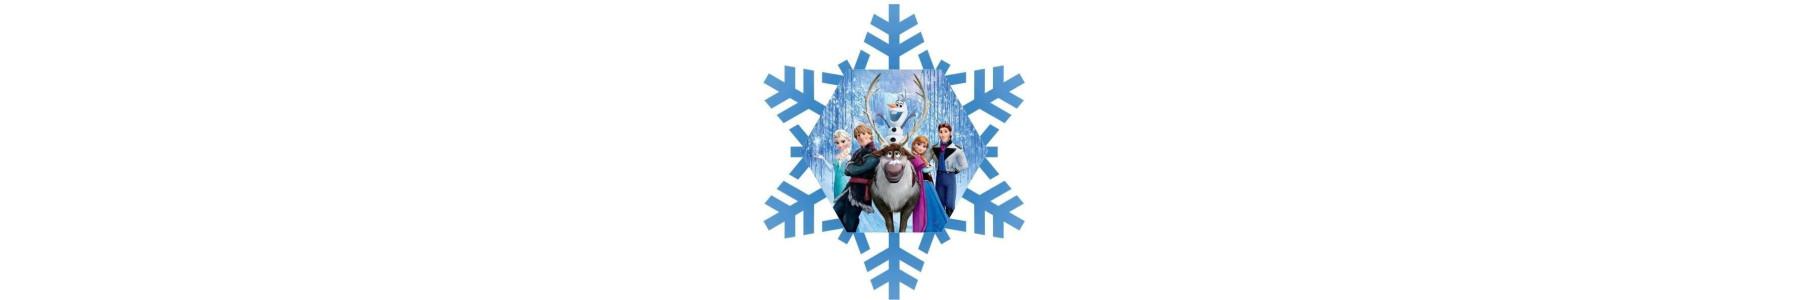 Accesorii de petrecere Frozen Snowflakes